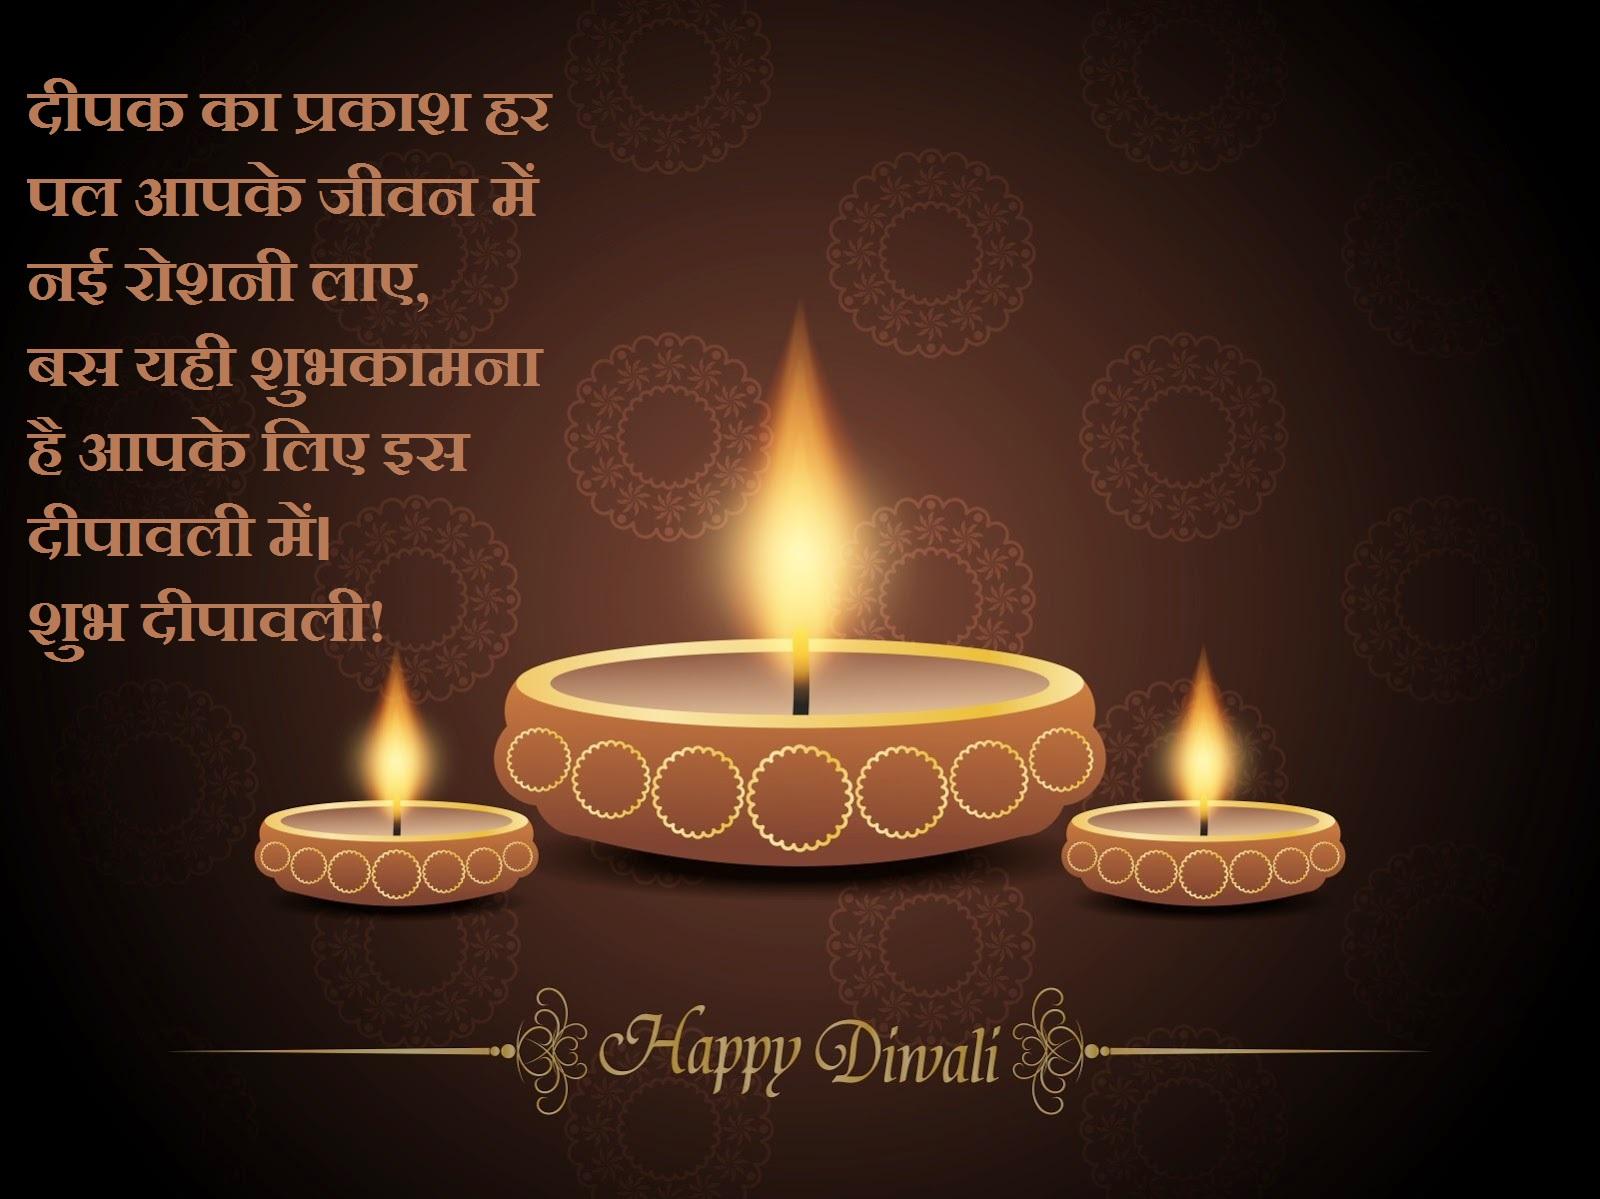 Diwali 2016 ShubhKamnaye Messages & SMS {दिवाली की शुभकामनाये}